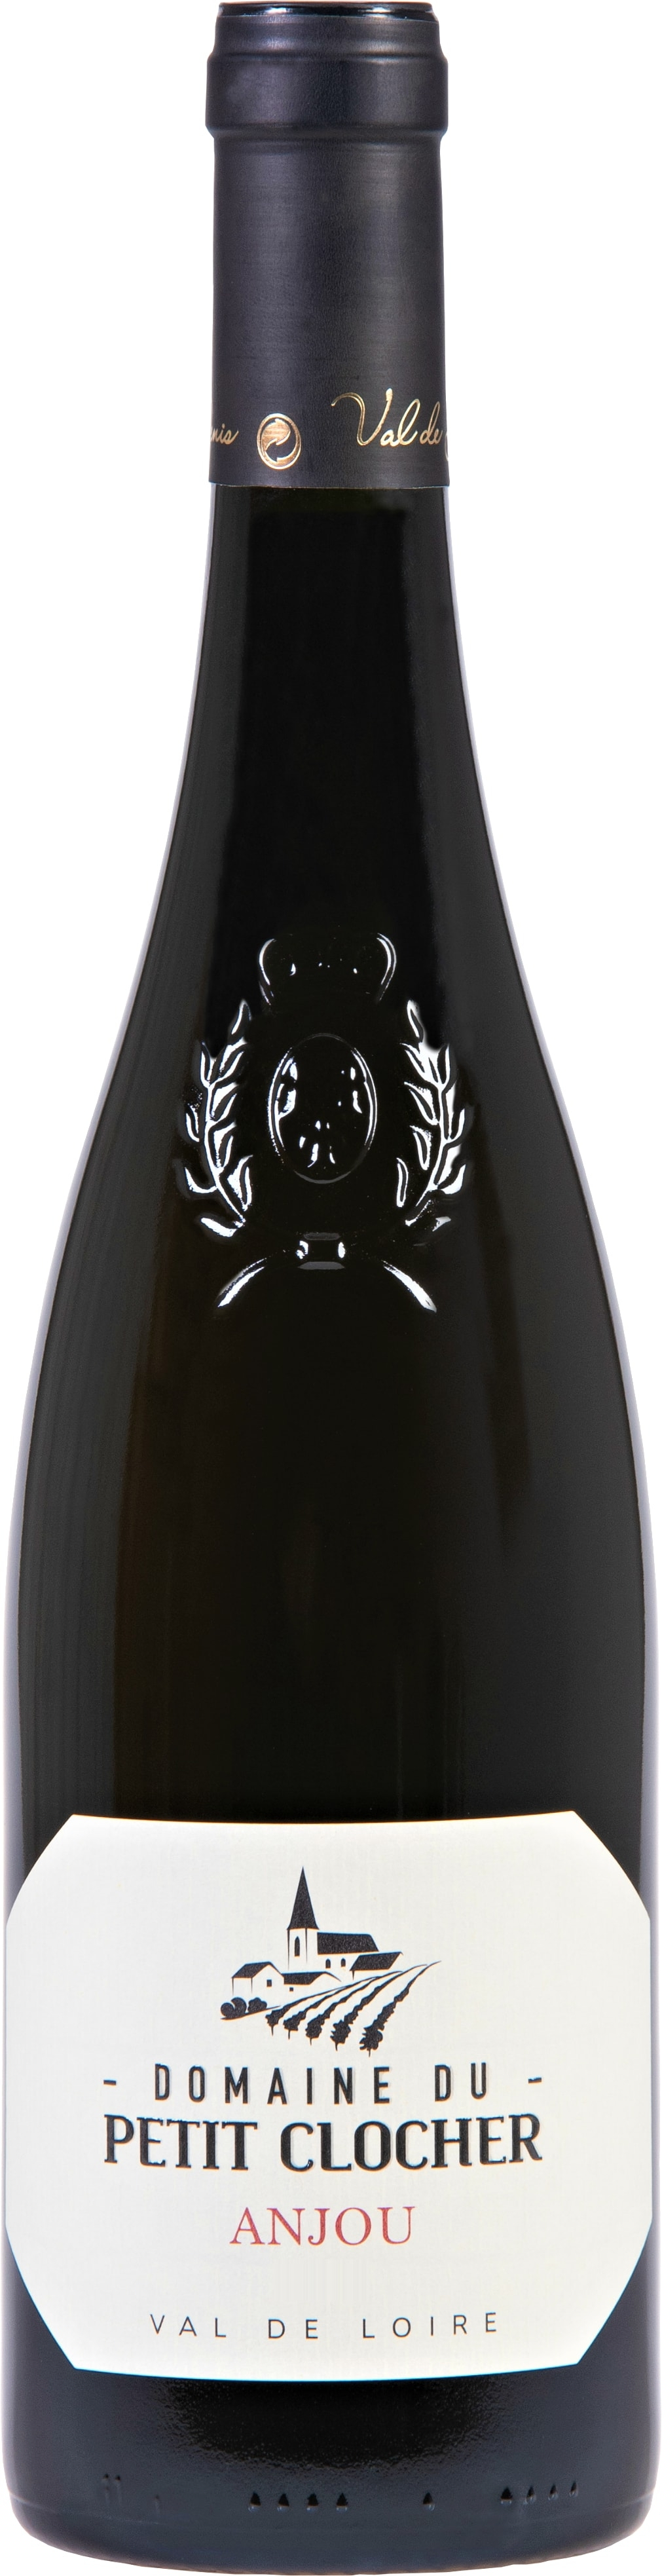 Caudalia wine Box Diciembre 2020 Cabernet Franc Francia Domaine du Clocher